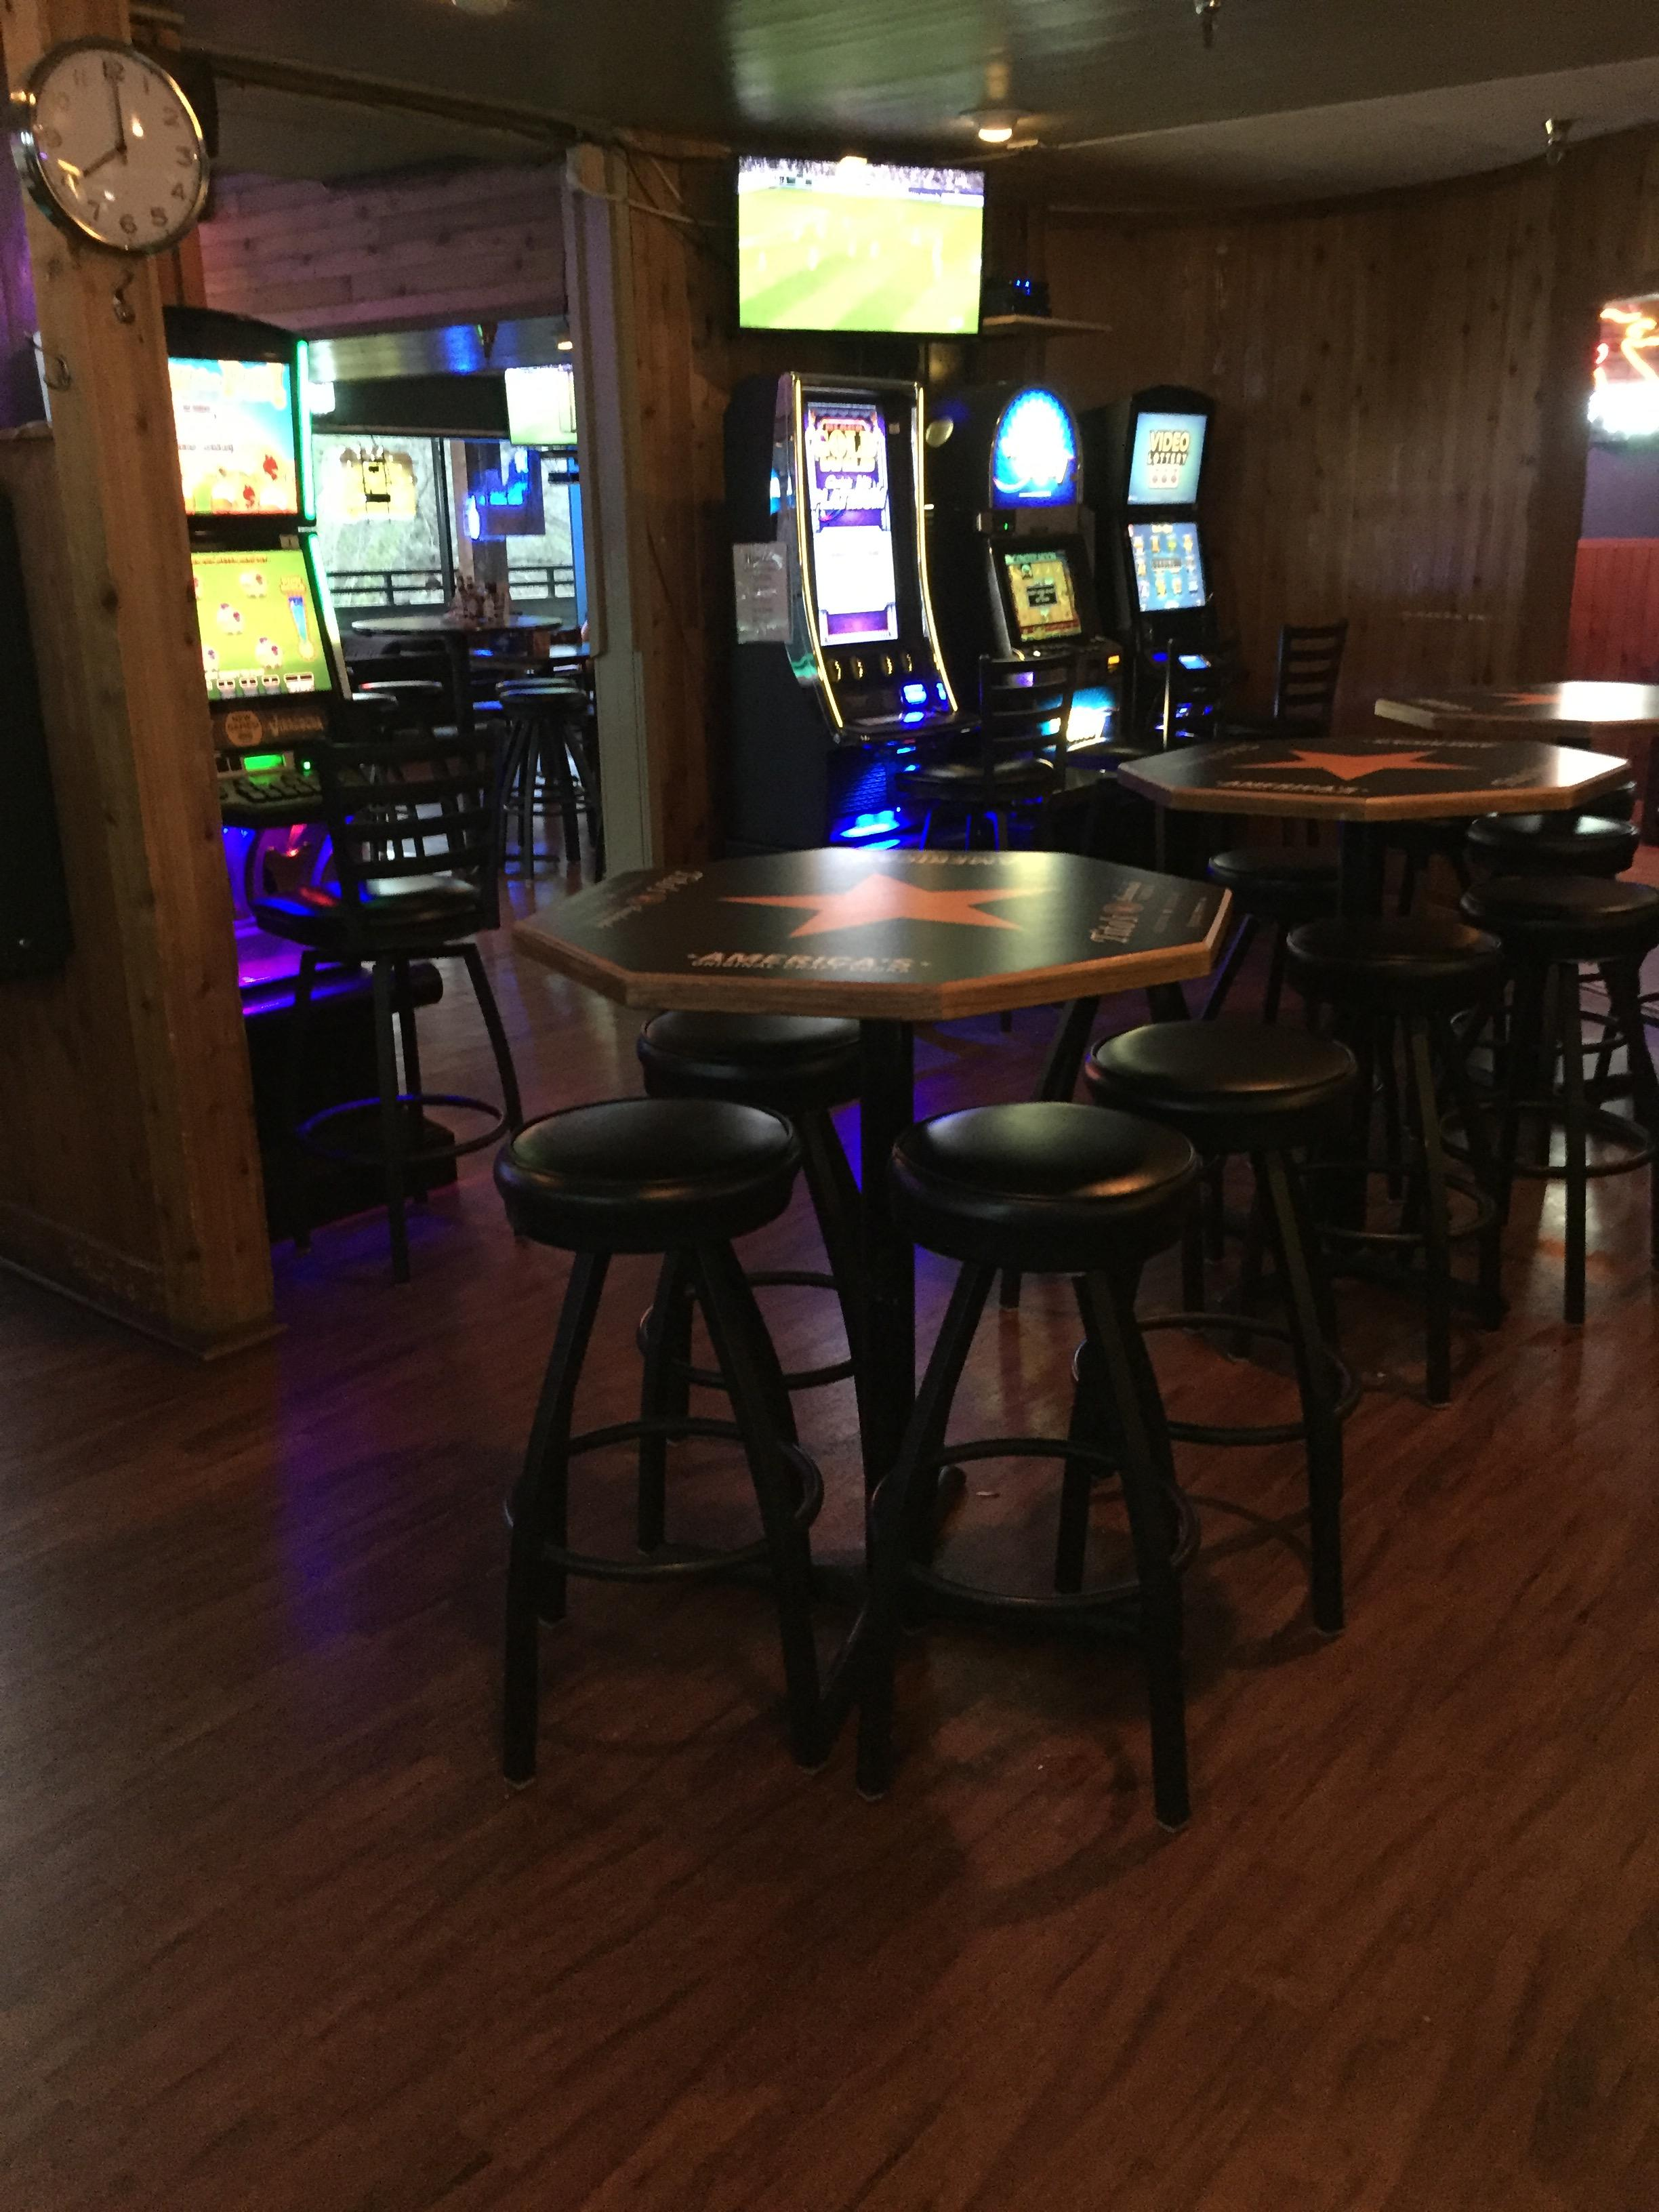 Hanko's Sports Bar & Grill image 5